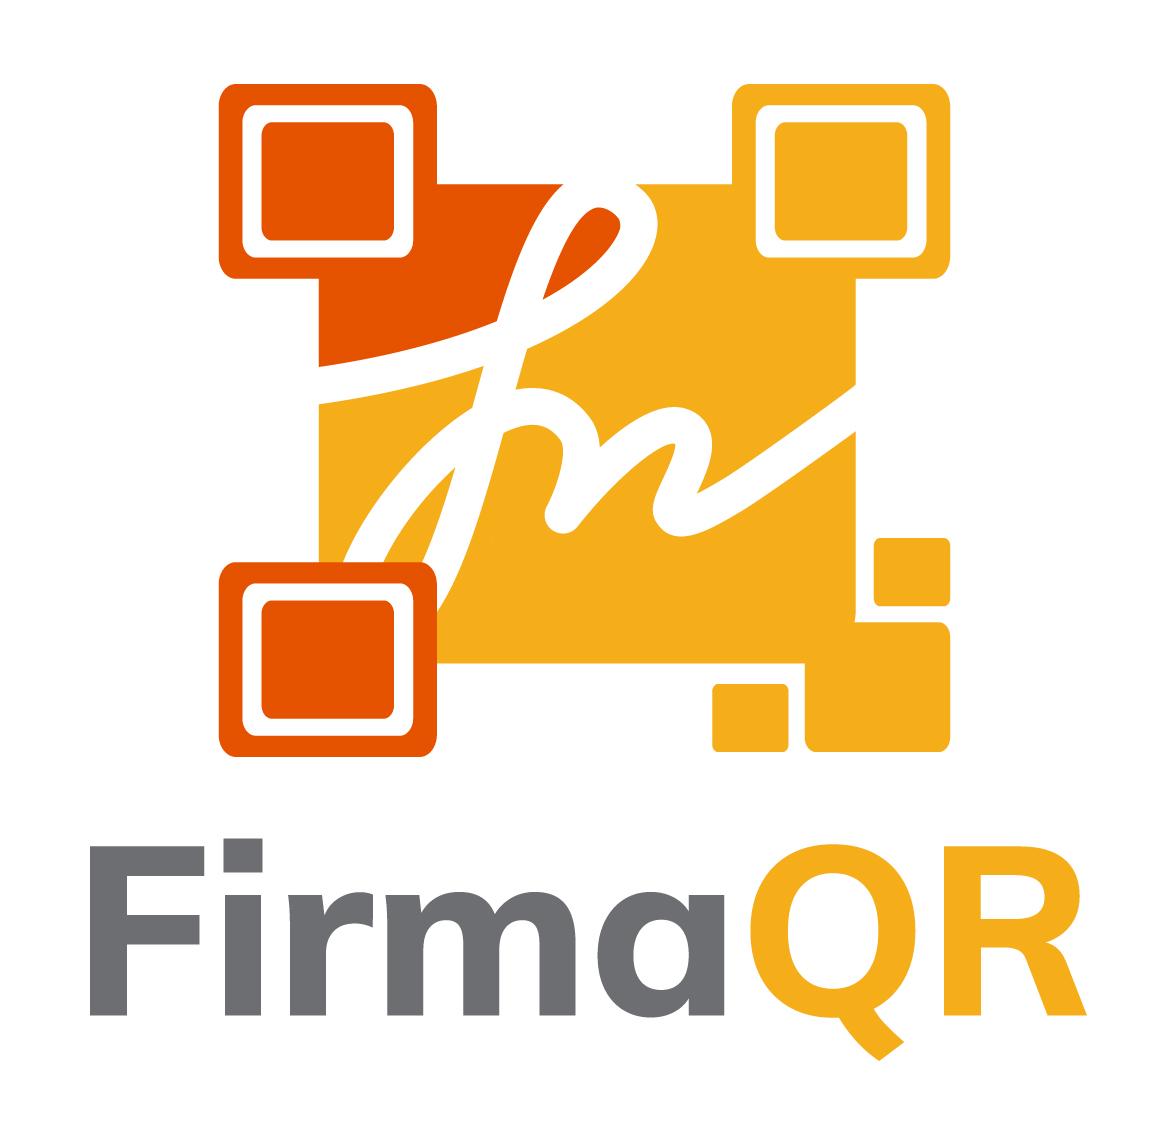 Logotipo firmaQR - vertical fondo blanco